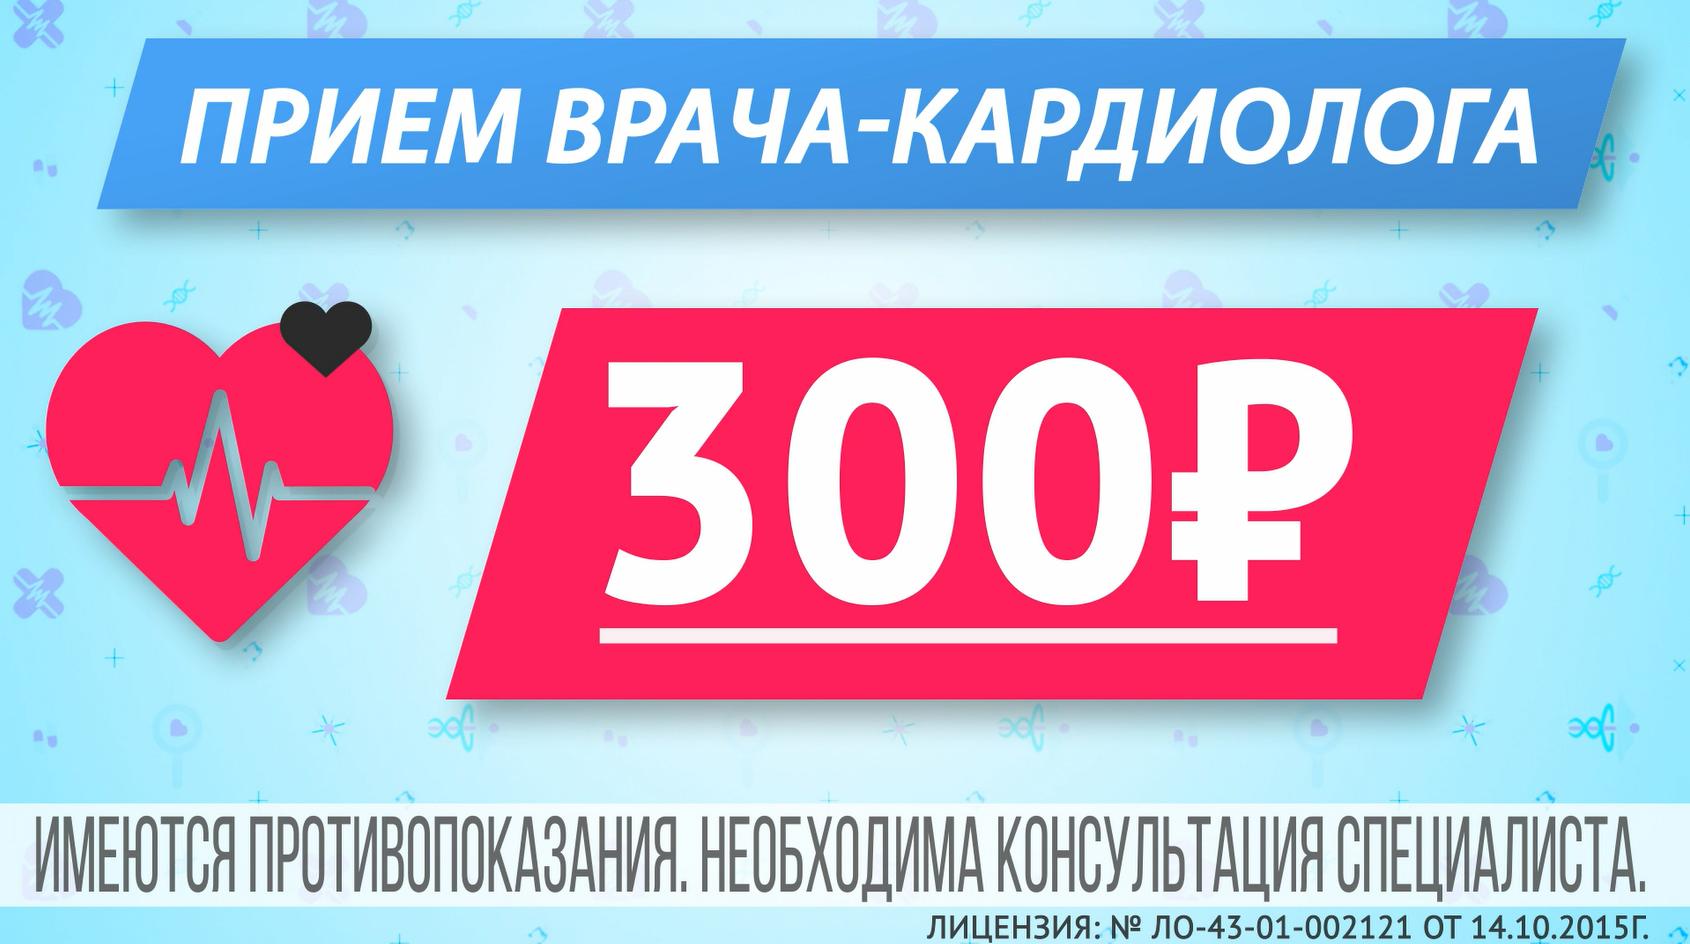 КАРДИОЛОГ 300